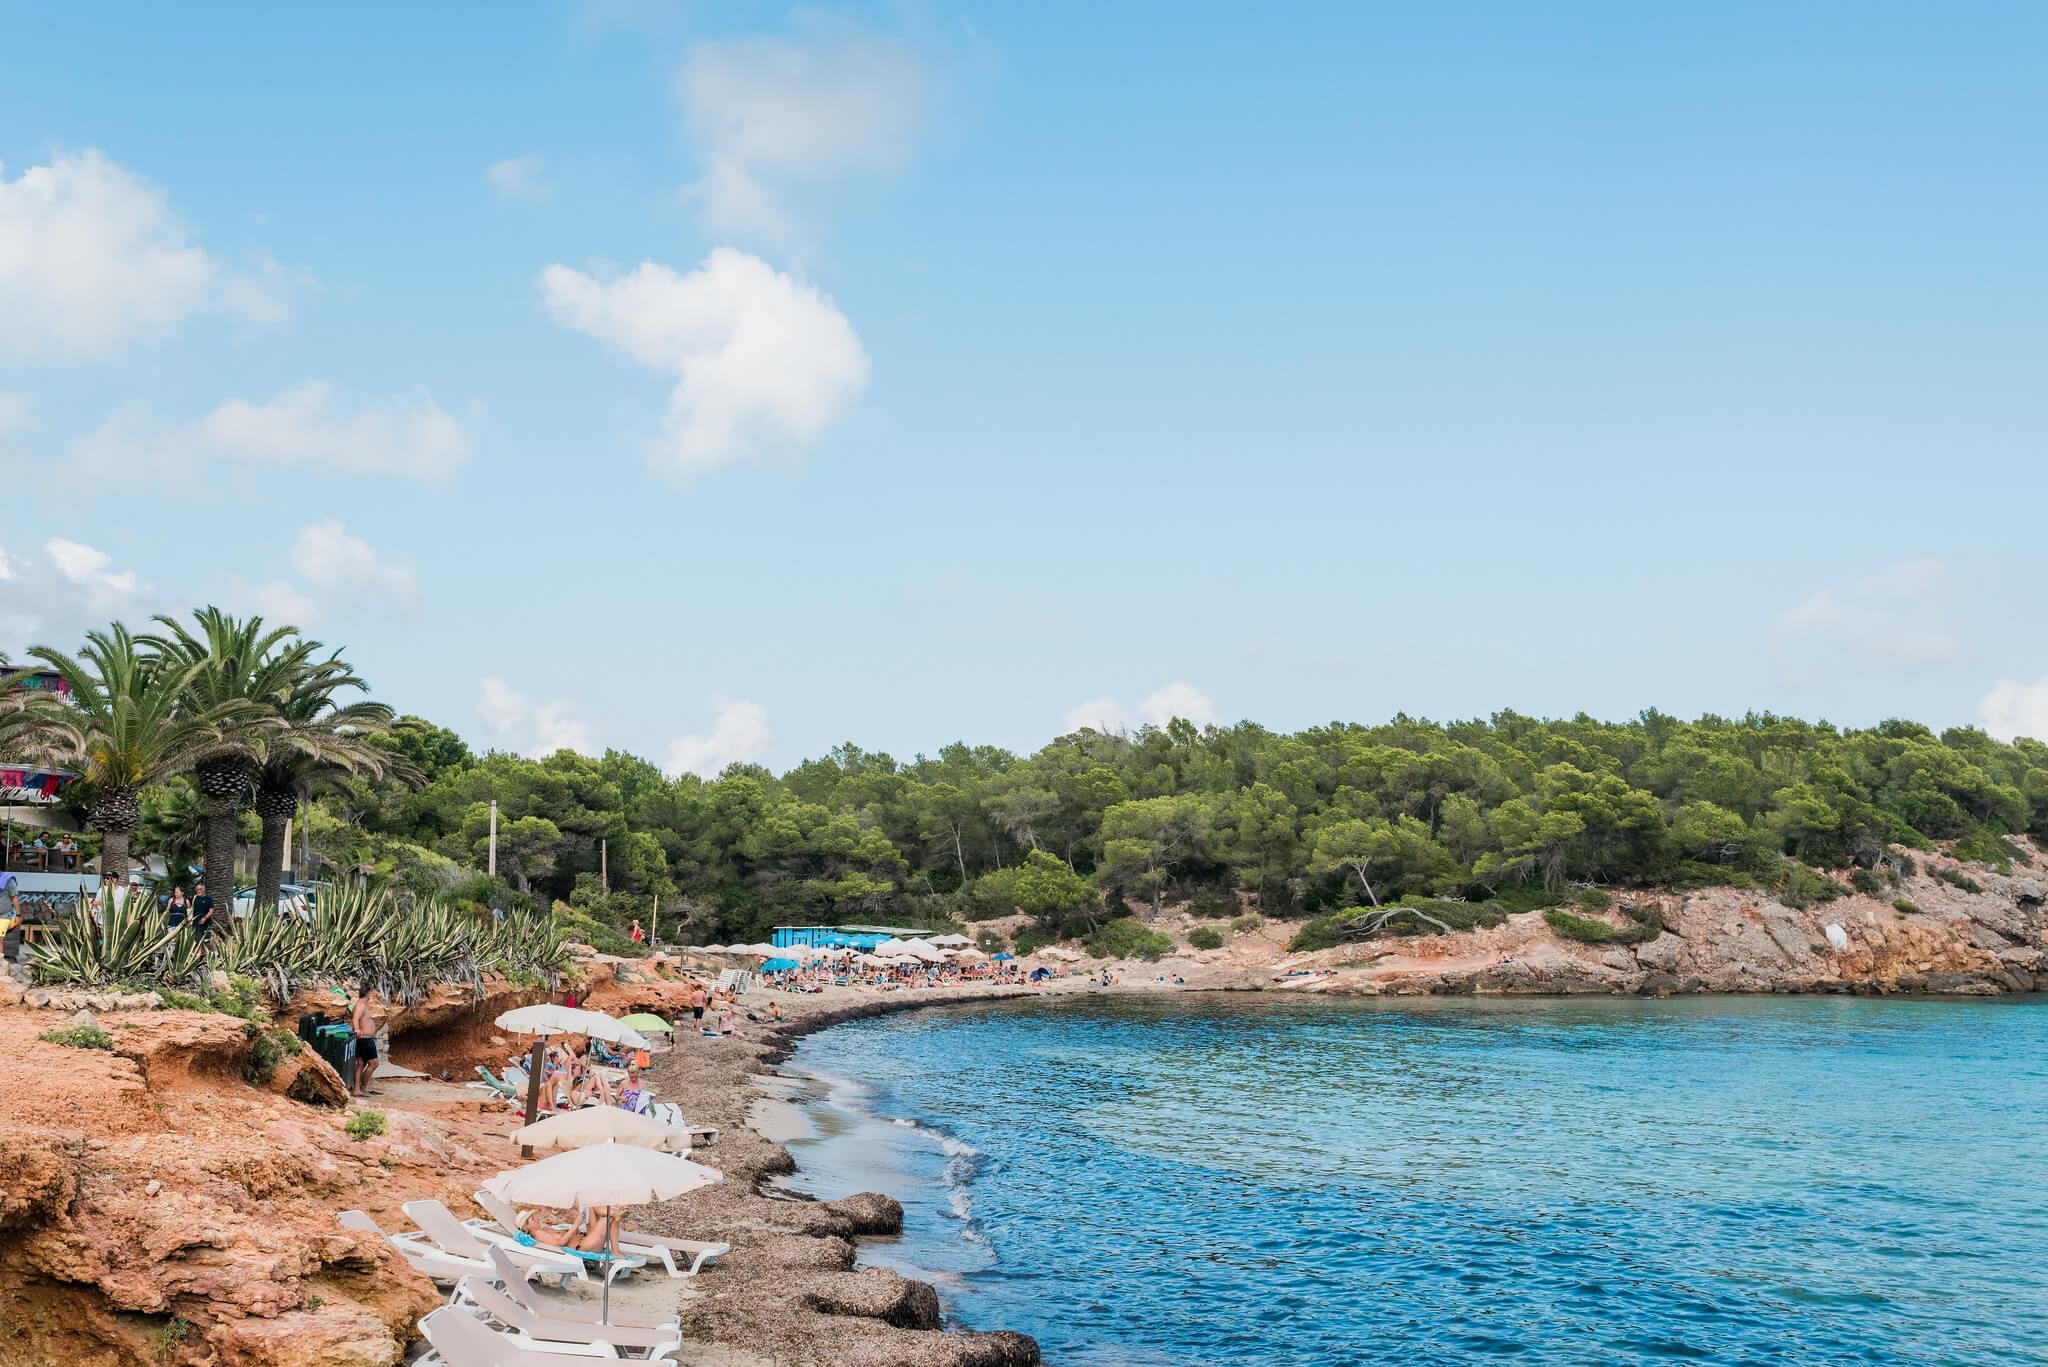 https://www.white-ibiza.com/wp-content/uploads/2020/03/ibiza-beaches-cala-nova-04.jpg